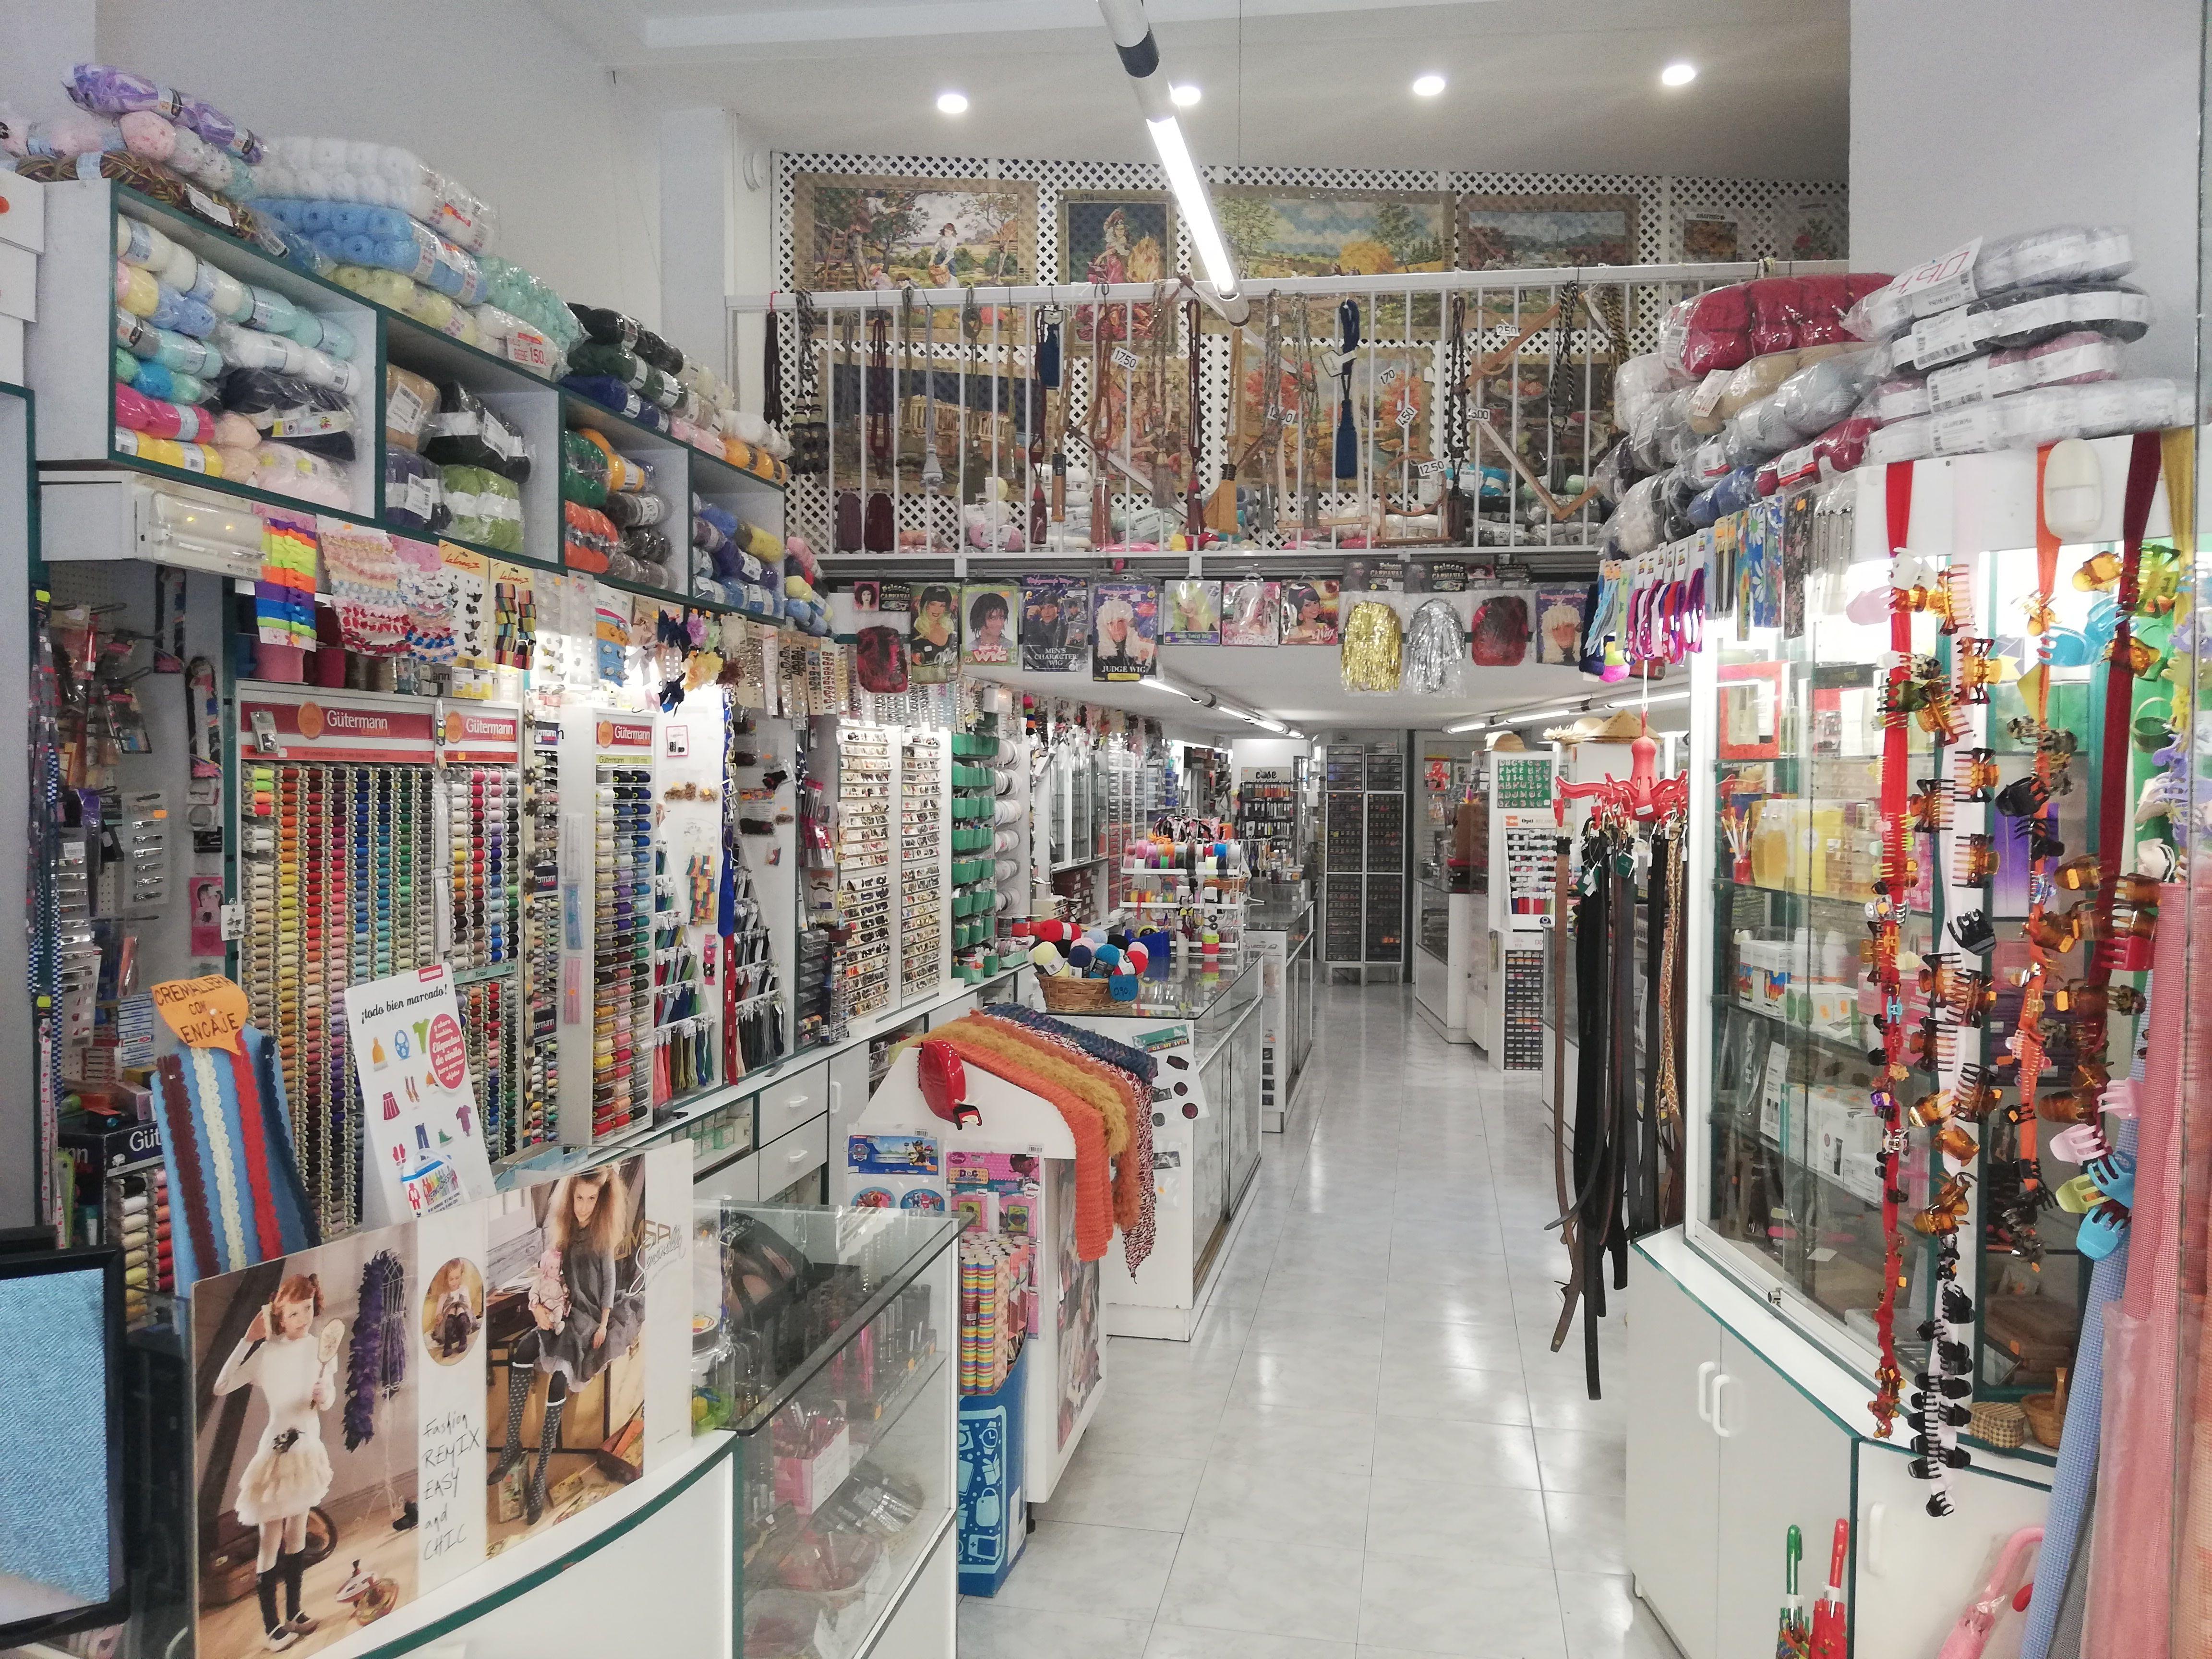 Tiendas de patchwork en Tenerife